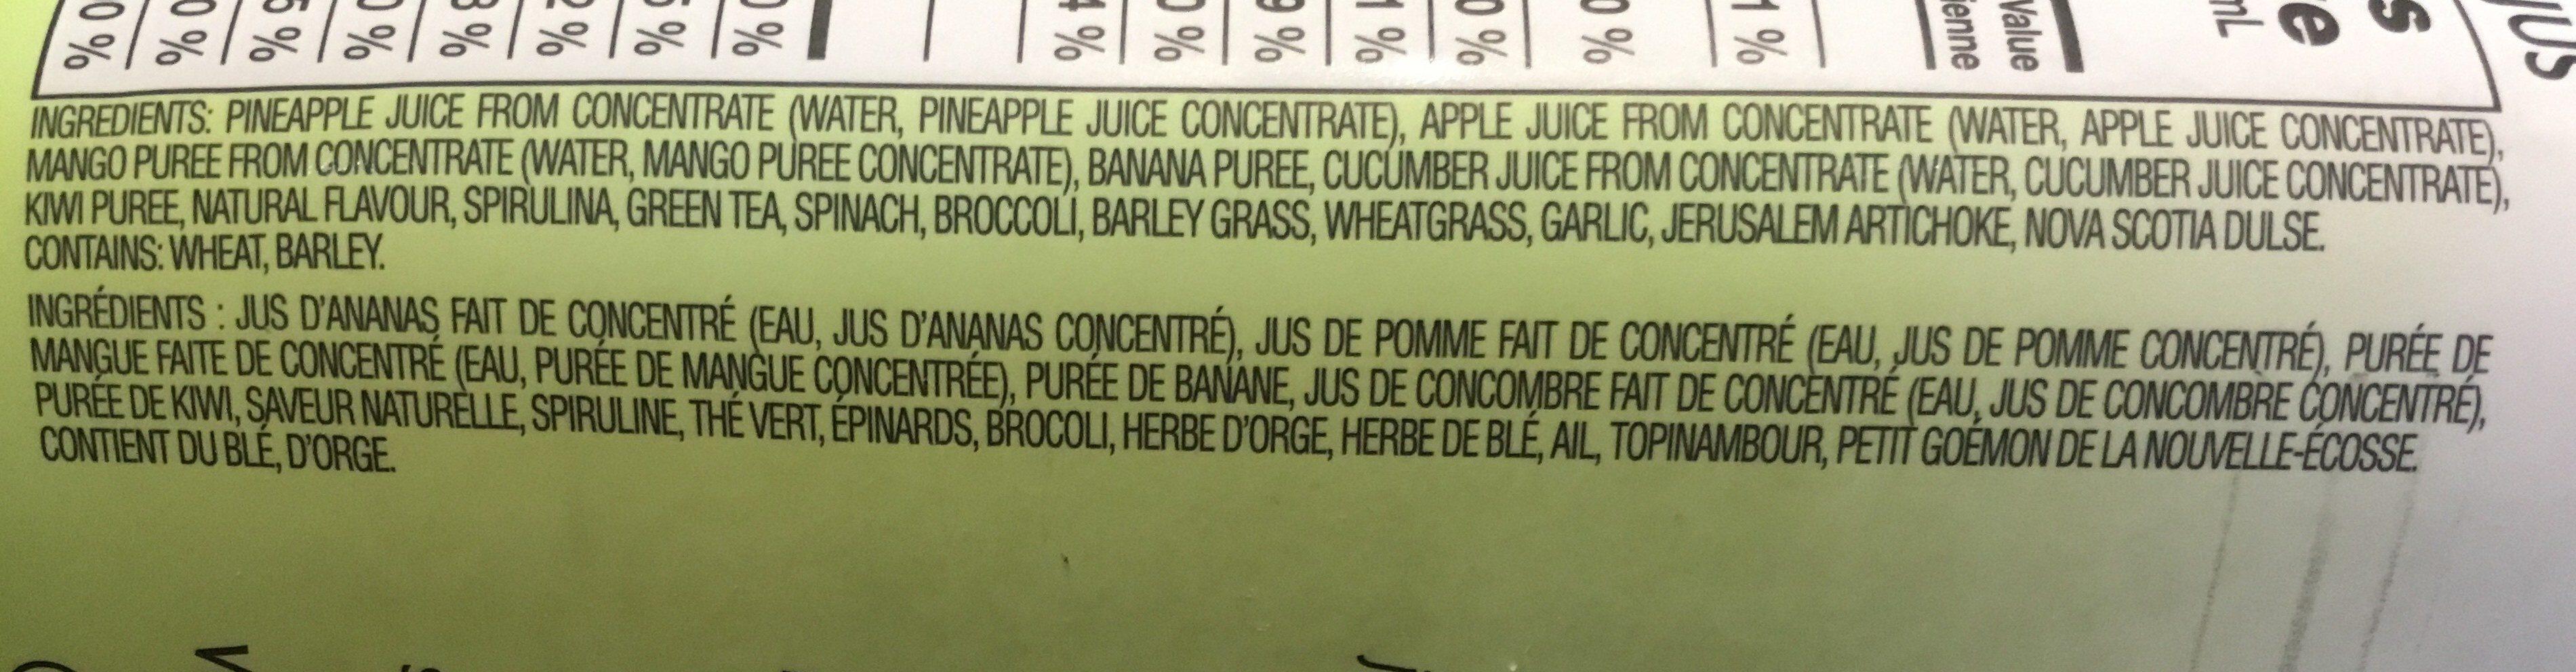 Green goodness smoothie - Ingredients